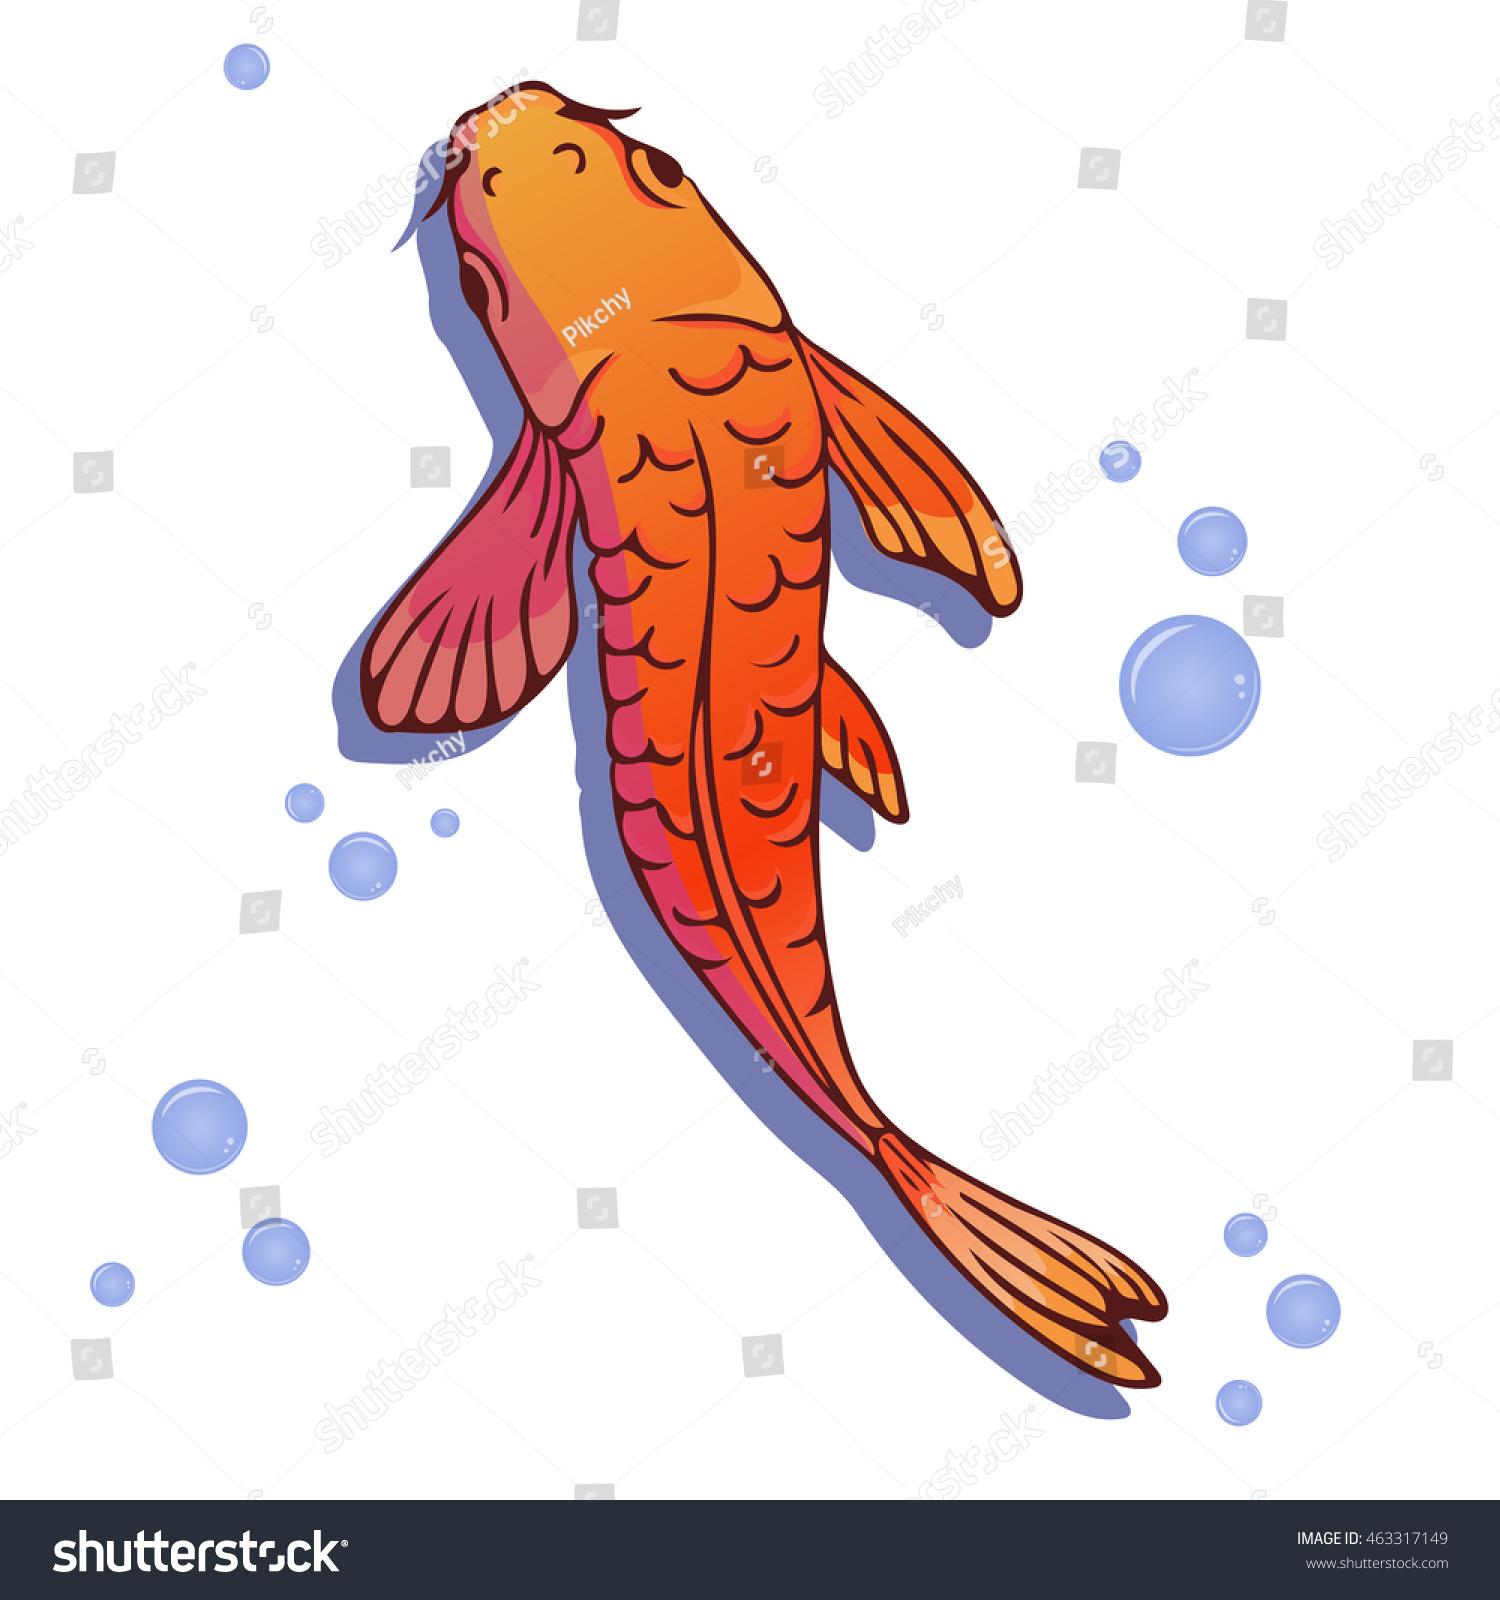 Red Gold Carp Koi Fish Vector Stock Vector 463317149 - Shutterstock